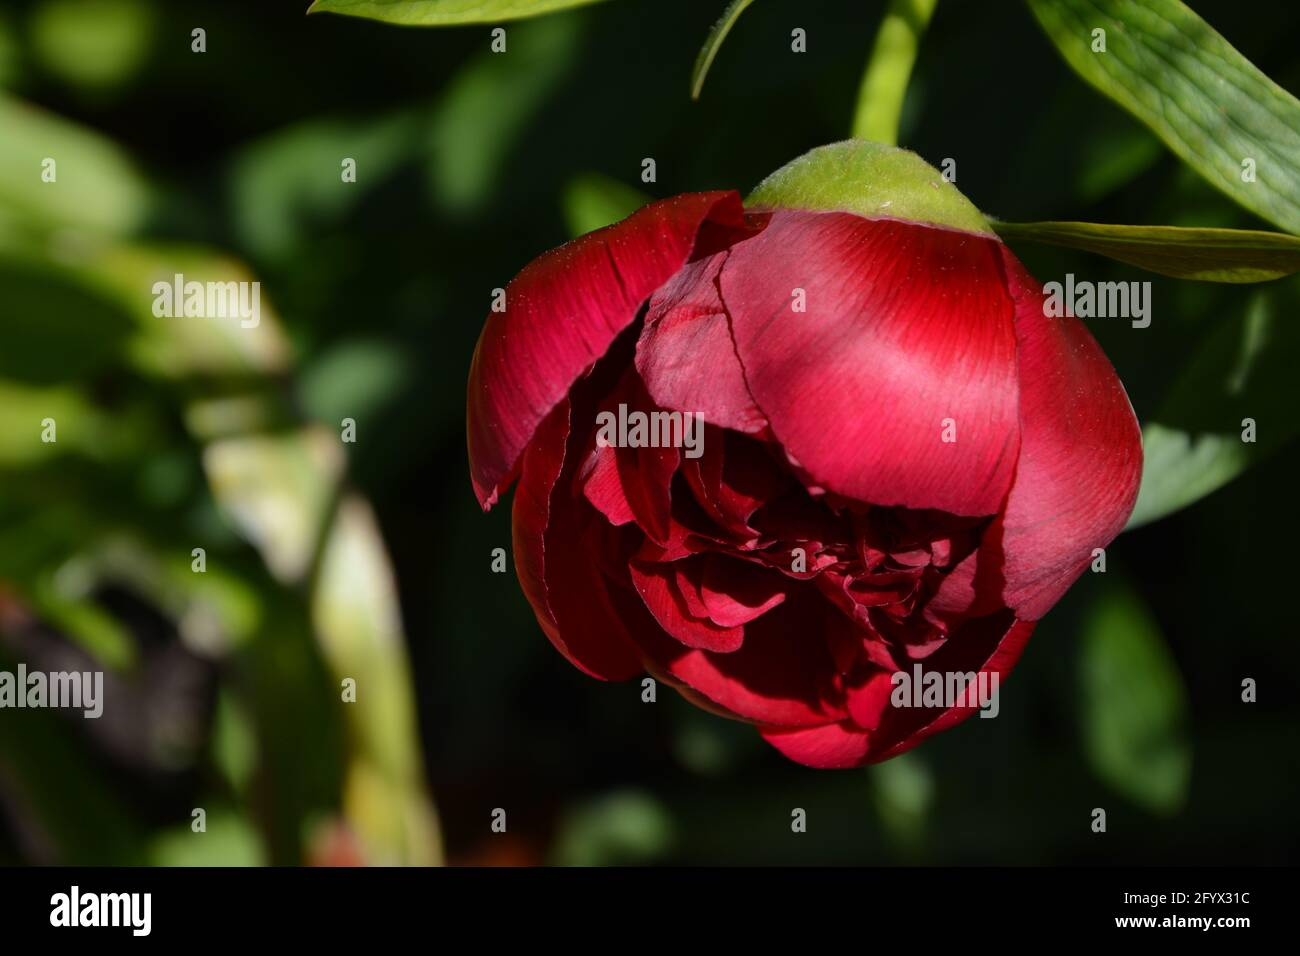 Magic Wand,Paeonia Officinalis Rubra Plena Cambridge UK, Purely Beautiful and Peaceful Floral Space Stock Photo